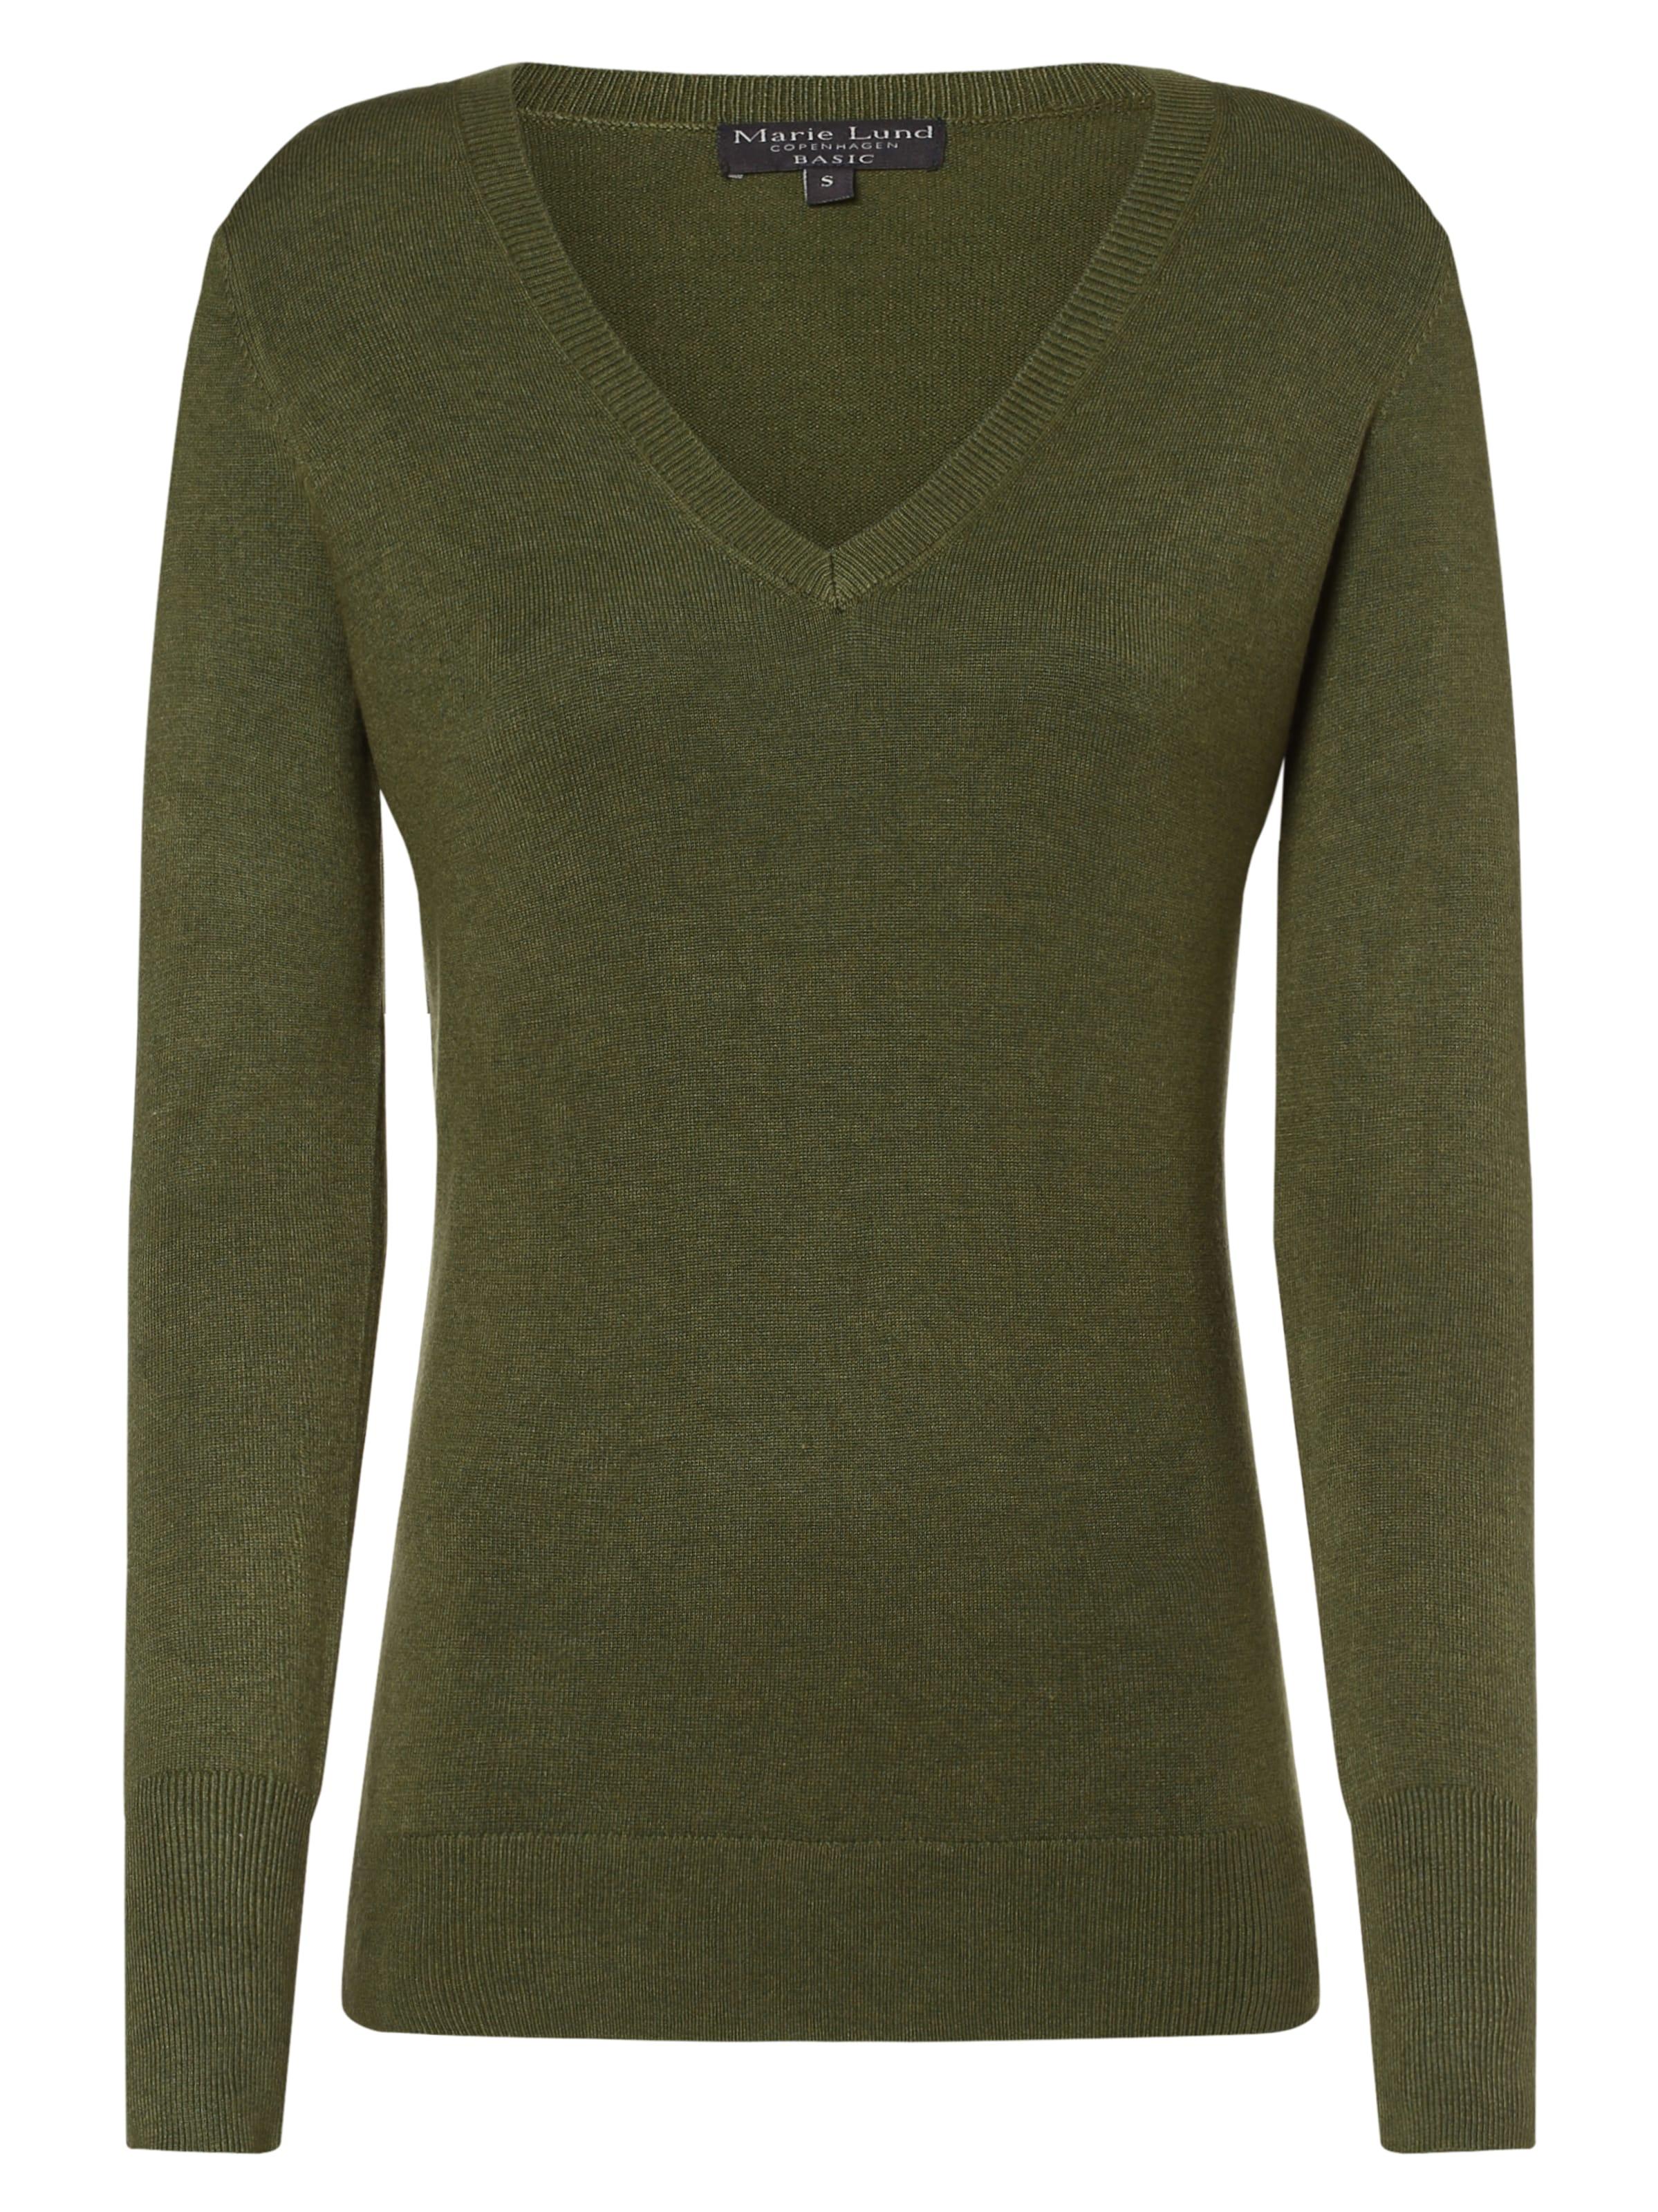 Khaki Pullover Marie Marie In Lund wPZX0OkN8n